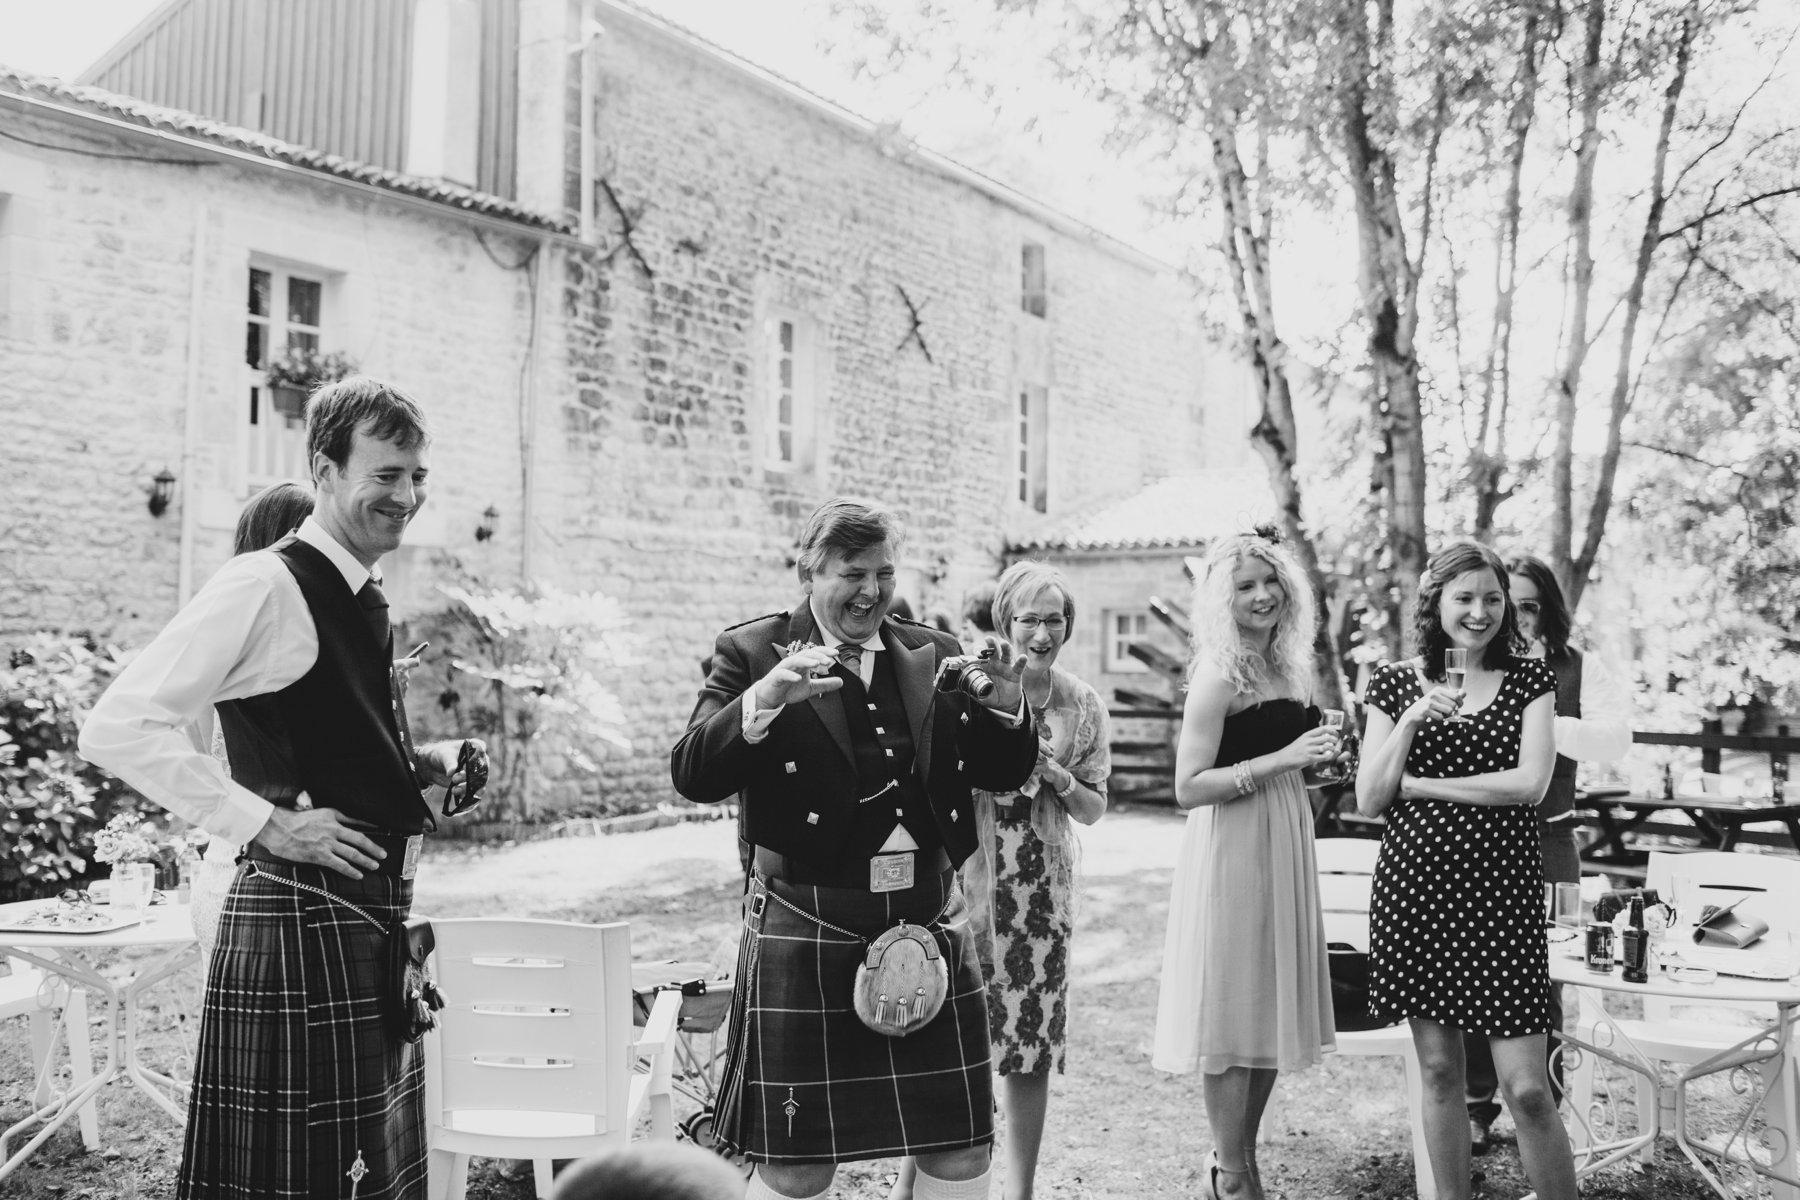 petitmoulin_france_bordeaux_weddings_0067